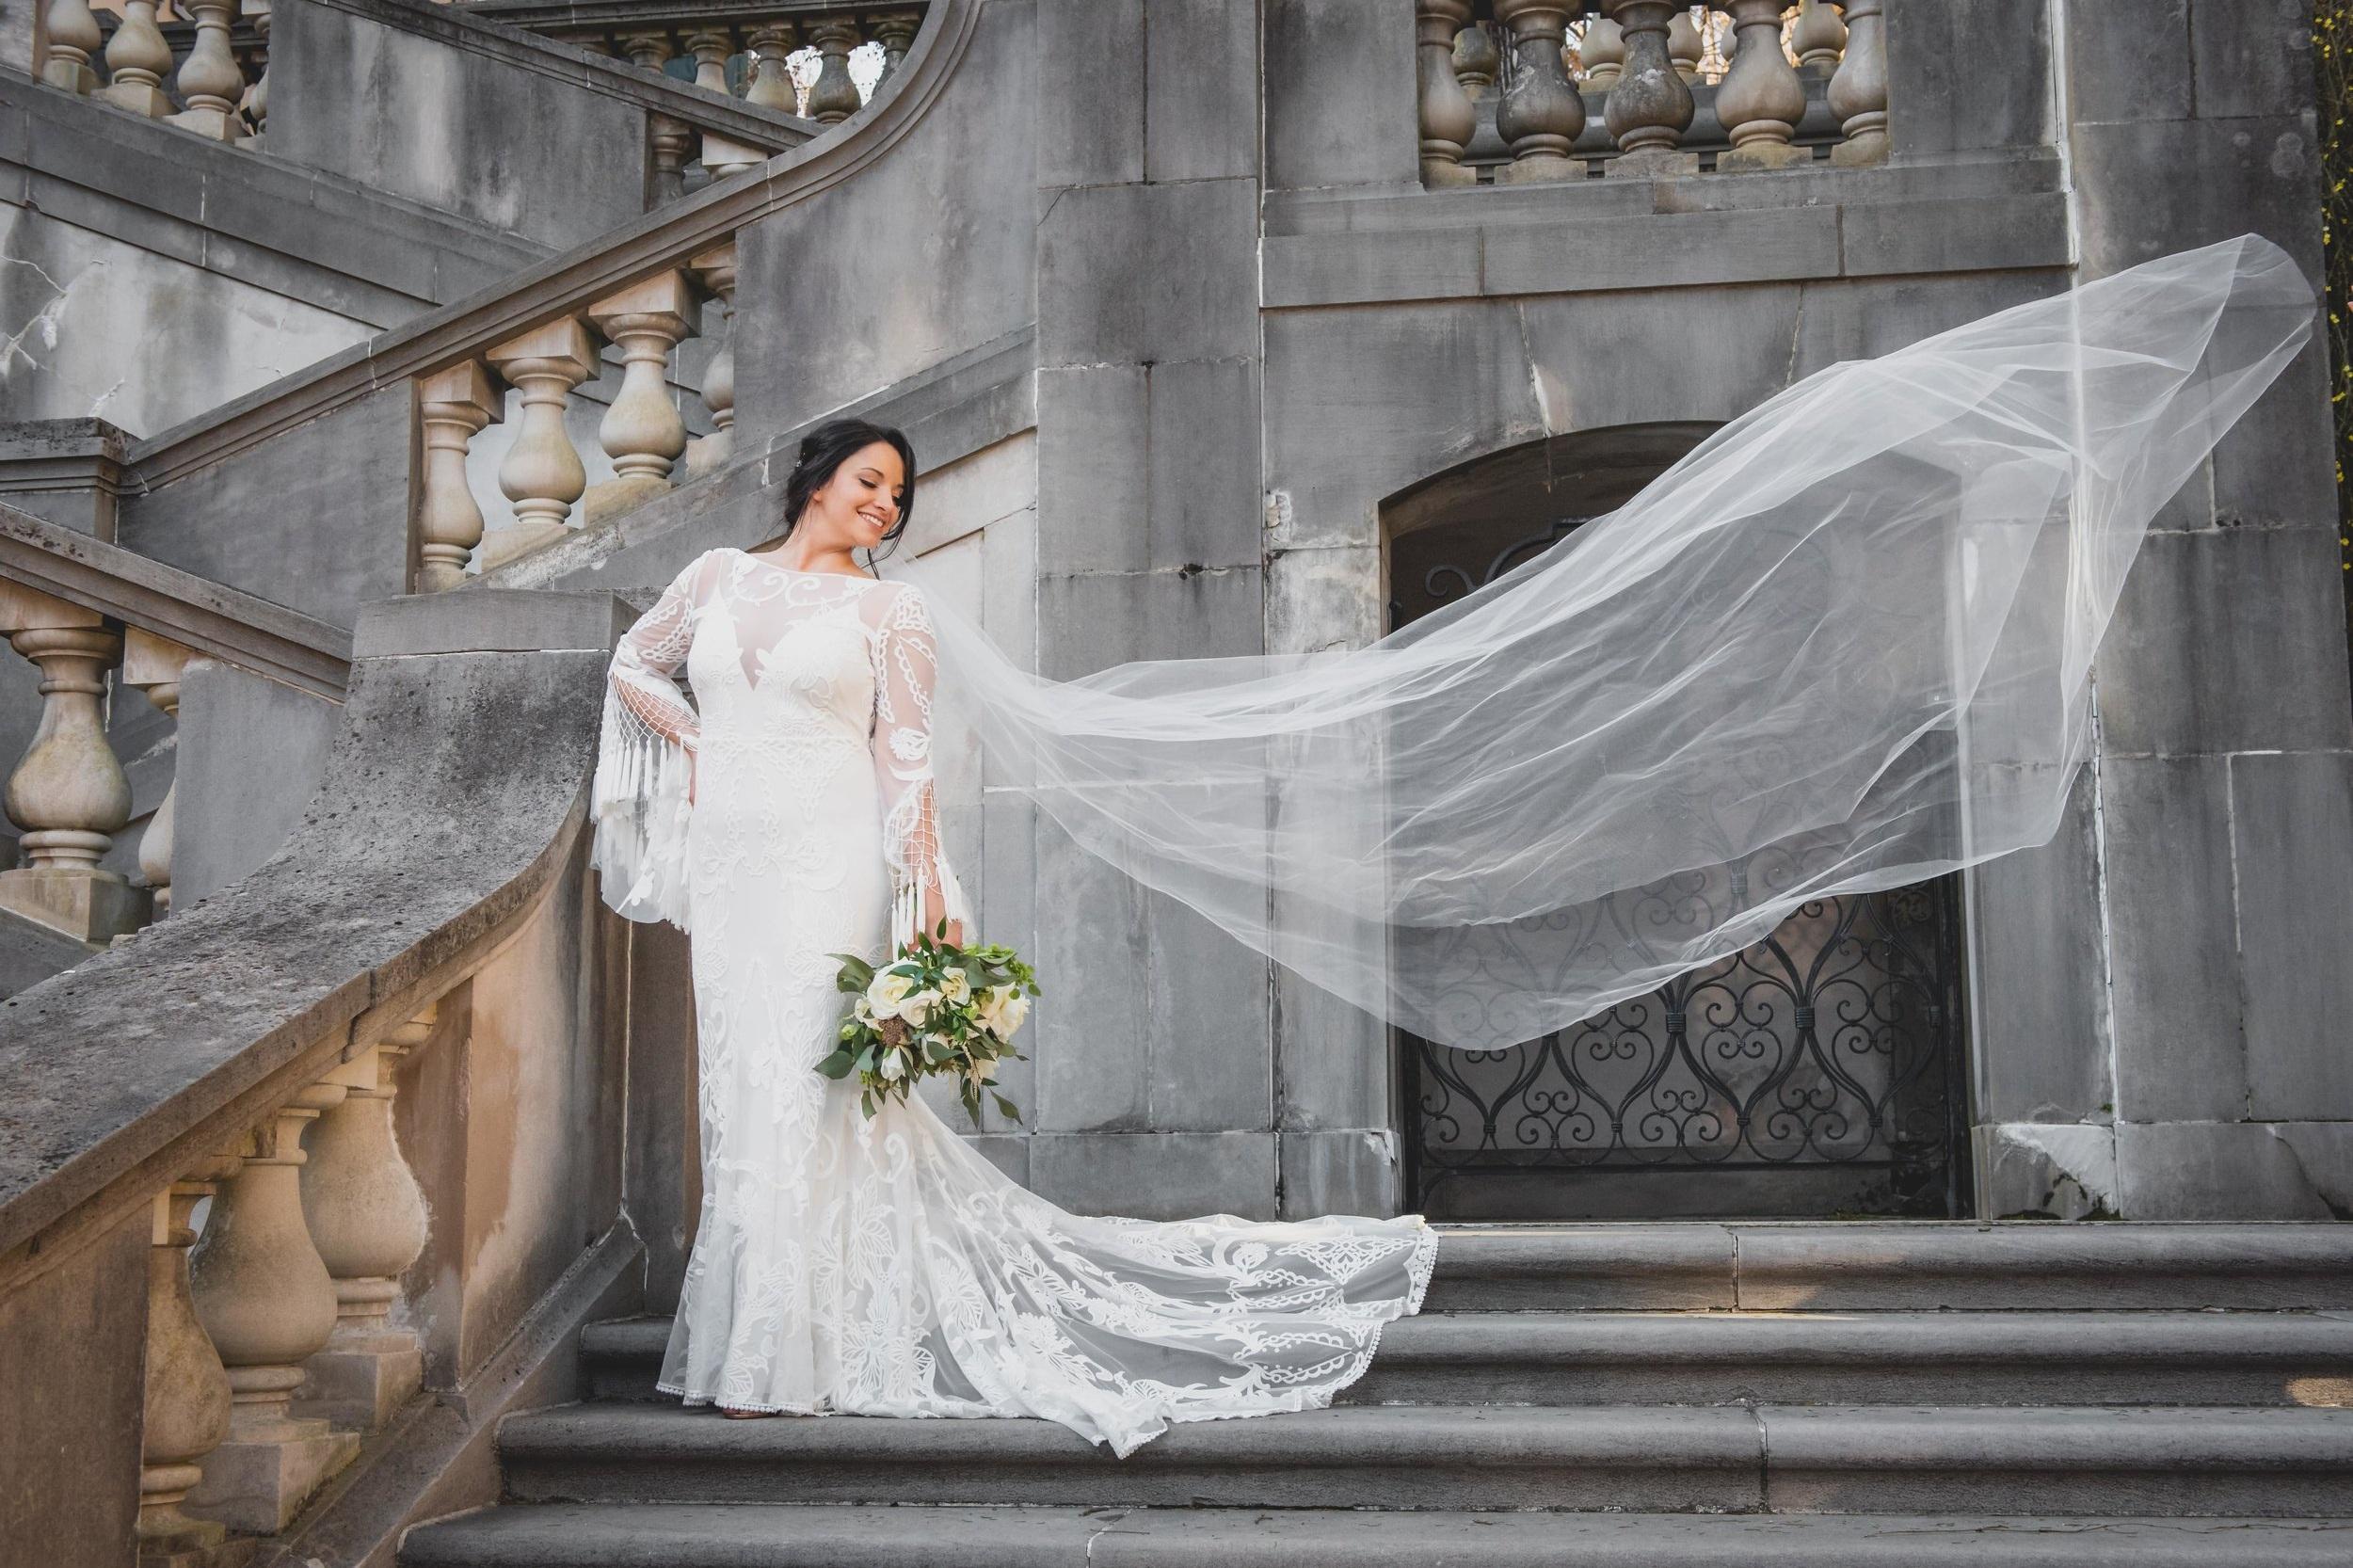 Wedding photography - Wedding Survival Kit - Bride